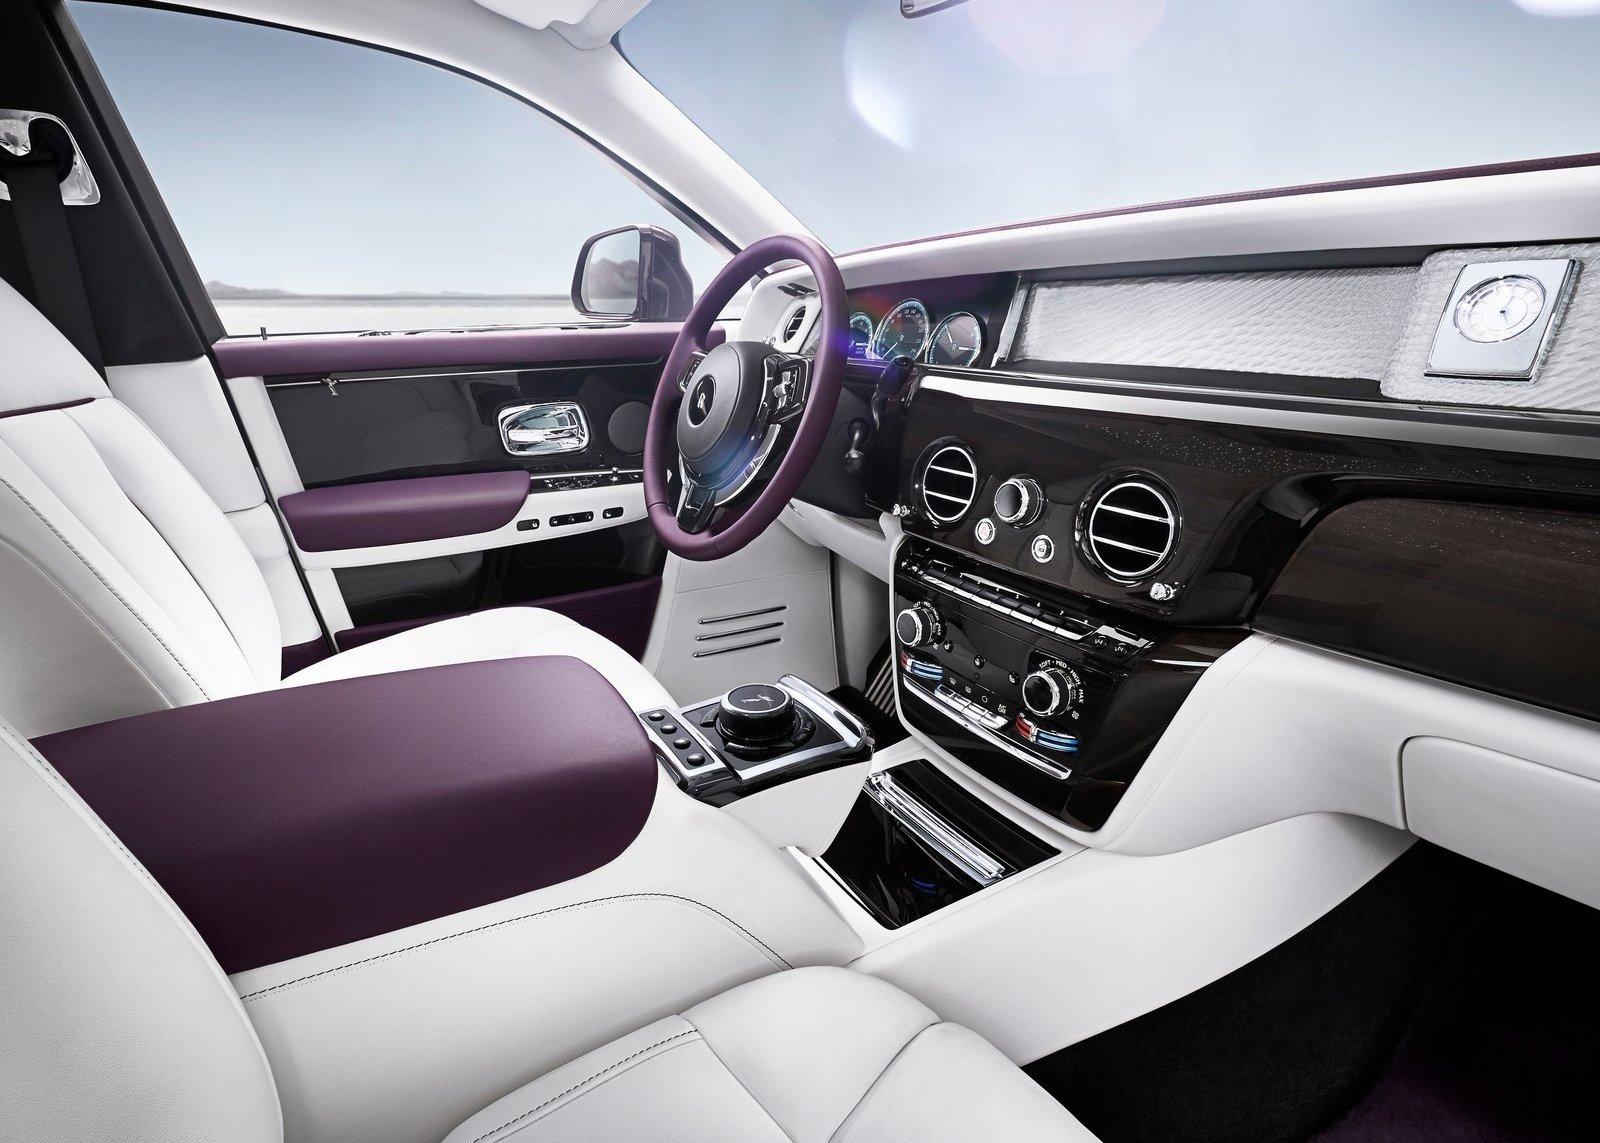 rolls royce phantom interior. 2018 Rolls-Royce Phantom-interior Rolls Royce Phantom Interior S